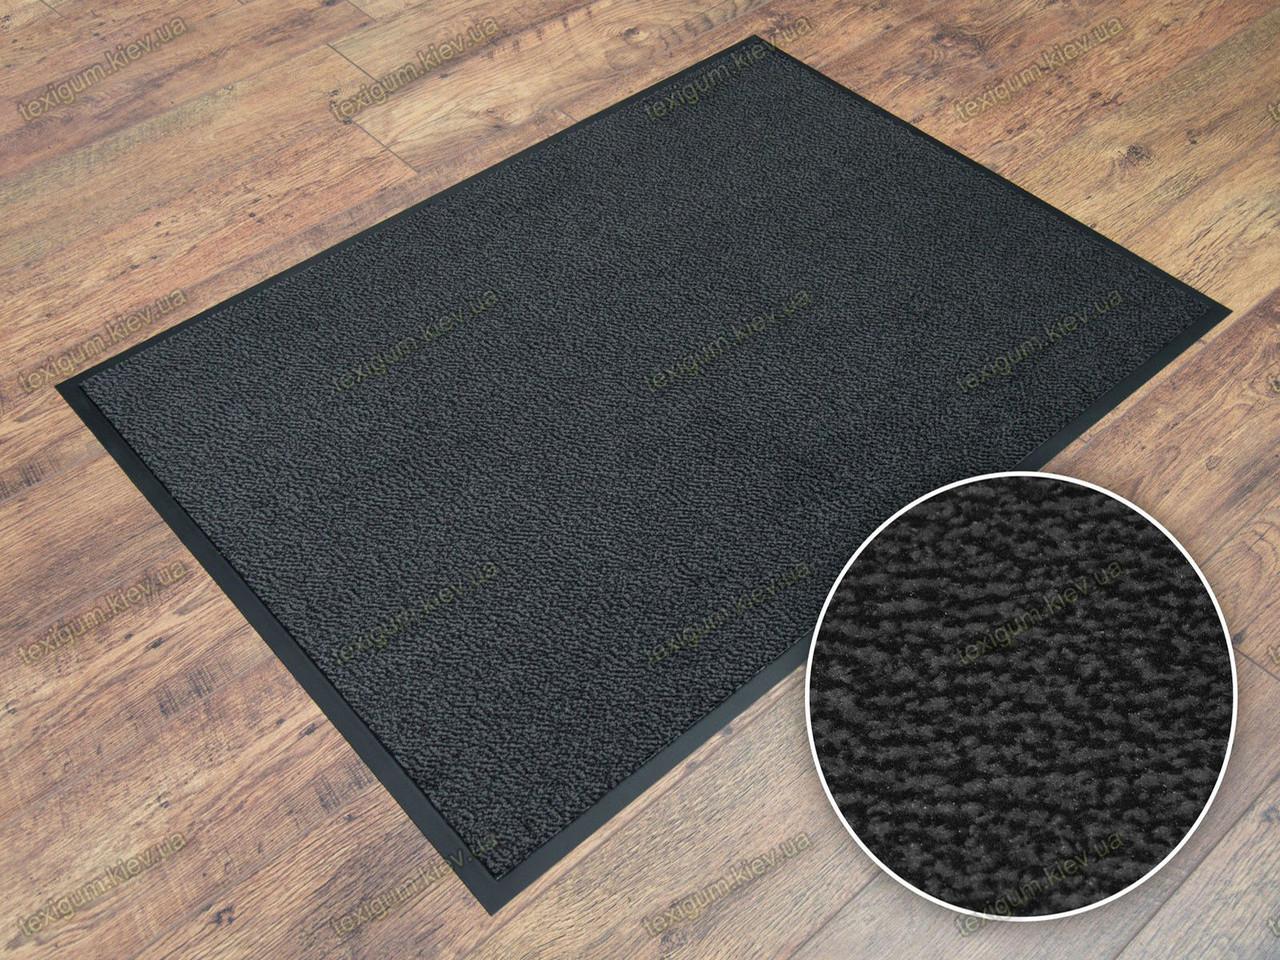 Грязезащитный ковер Париж темно-серый 90х120см